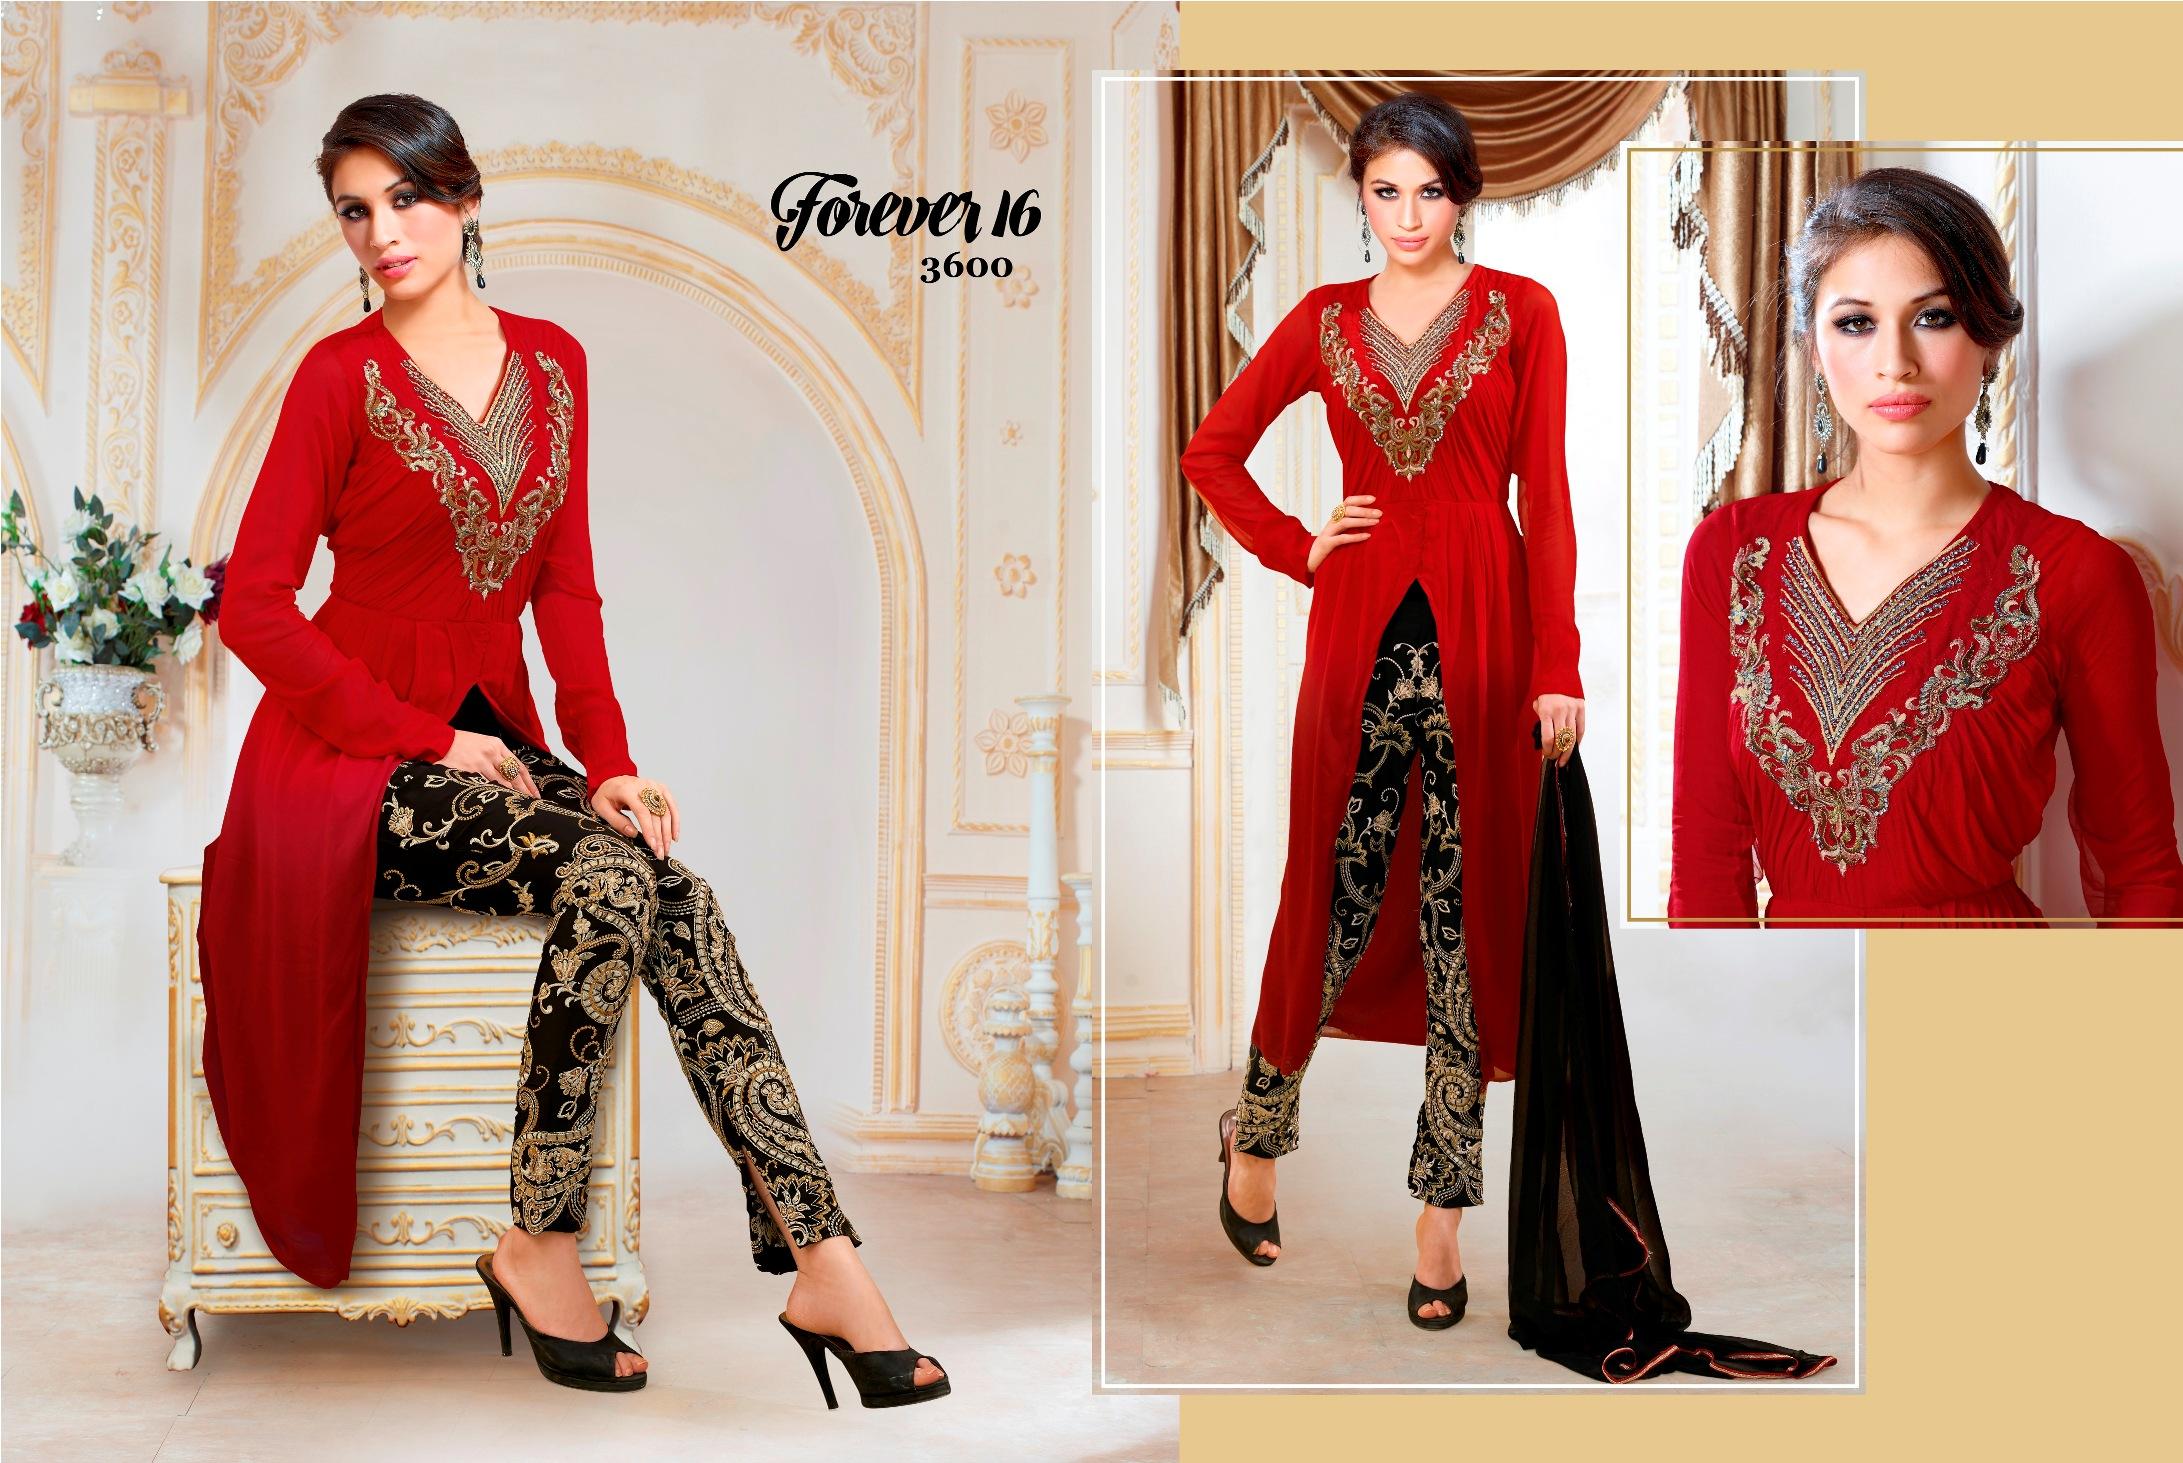 323b06591033 Ladies Designer Suits Manufacturer in Surat Gujarat India by Indian ...